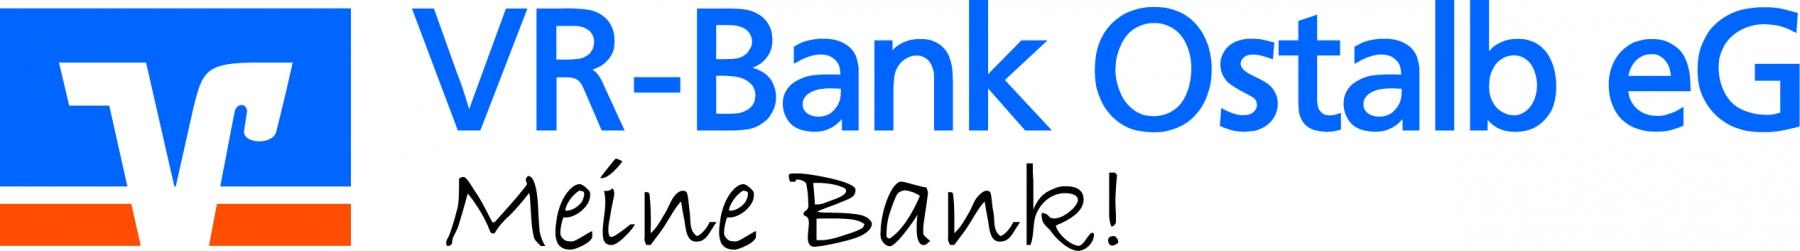 VR-BankOSTALBeG_Bildmarke_links_4c